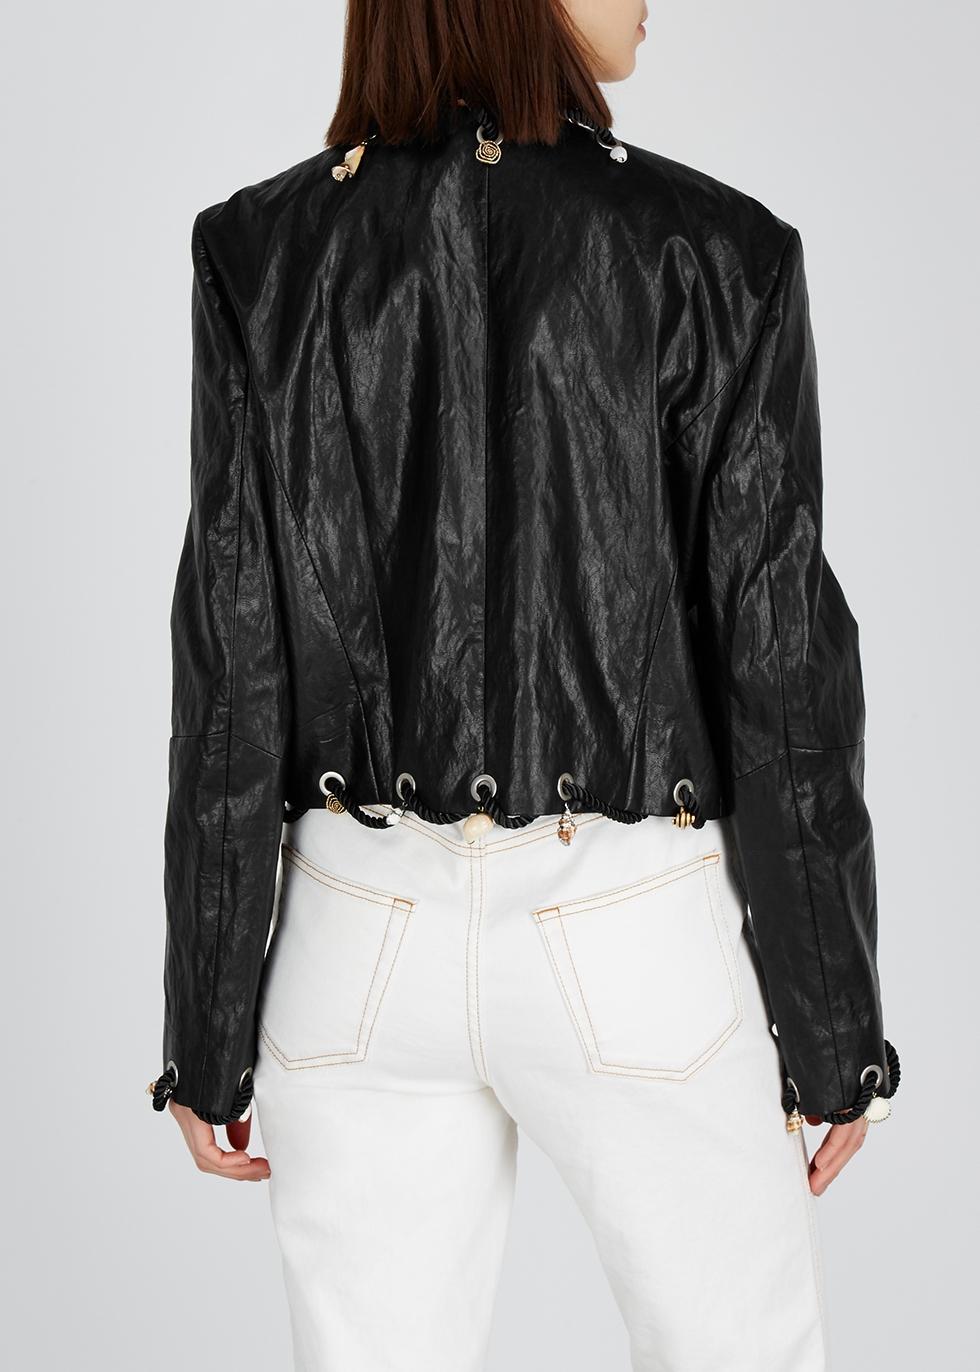 Ingrid embellished faux-leather jacket - Rejina Pyo